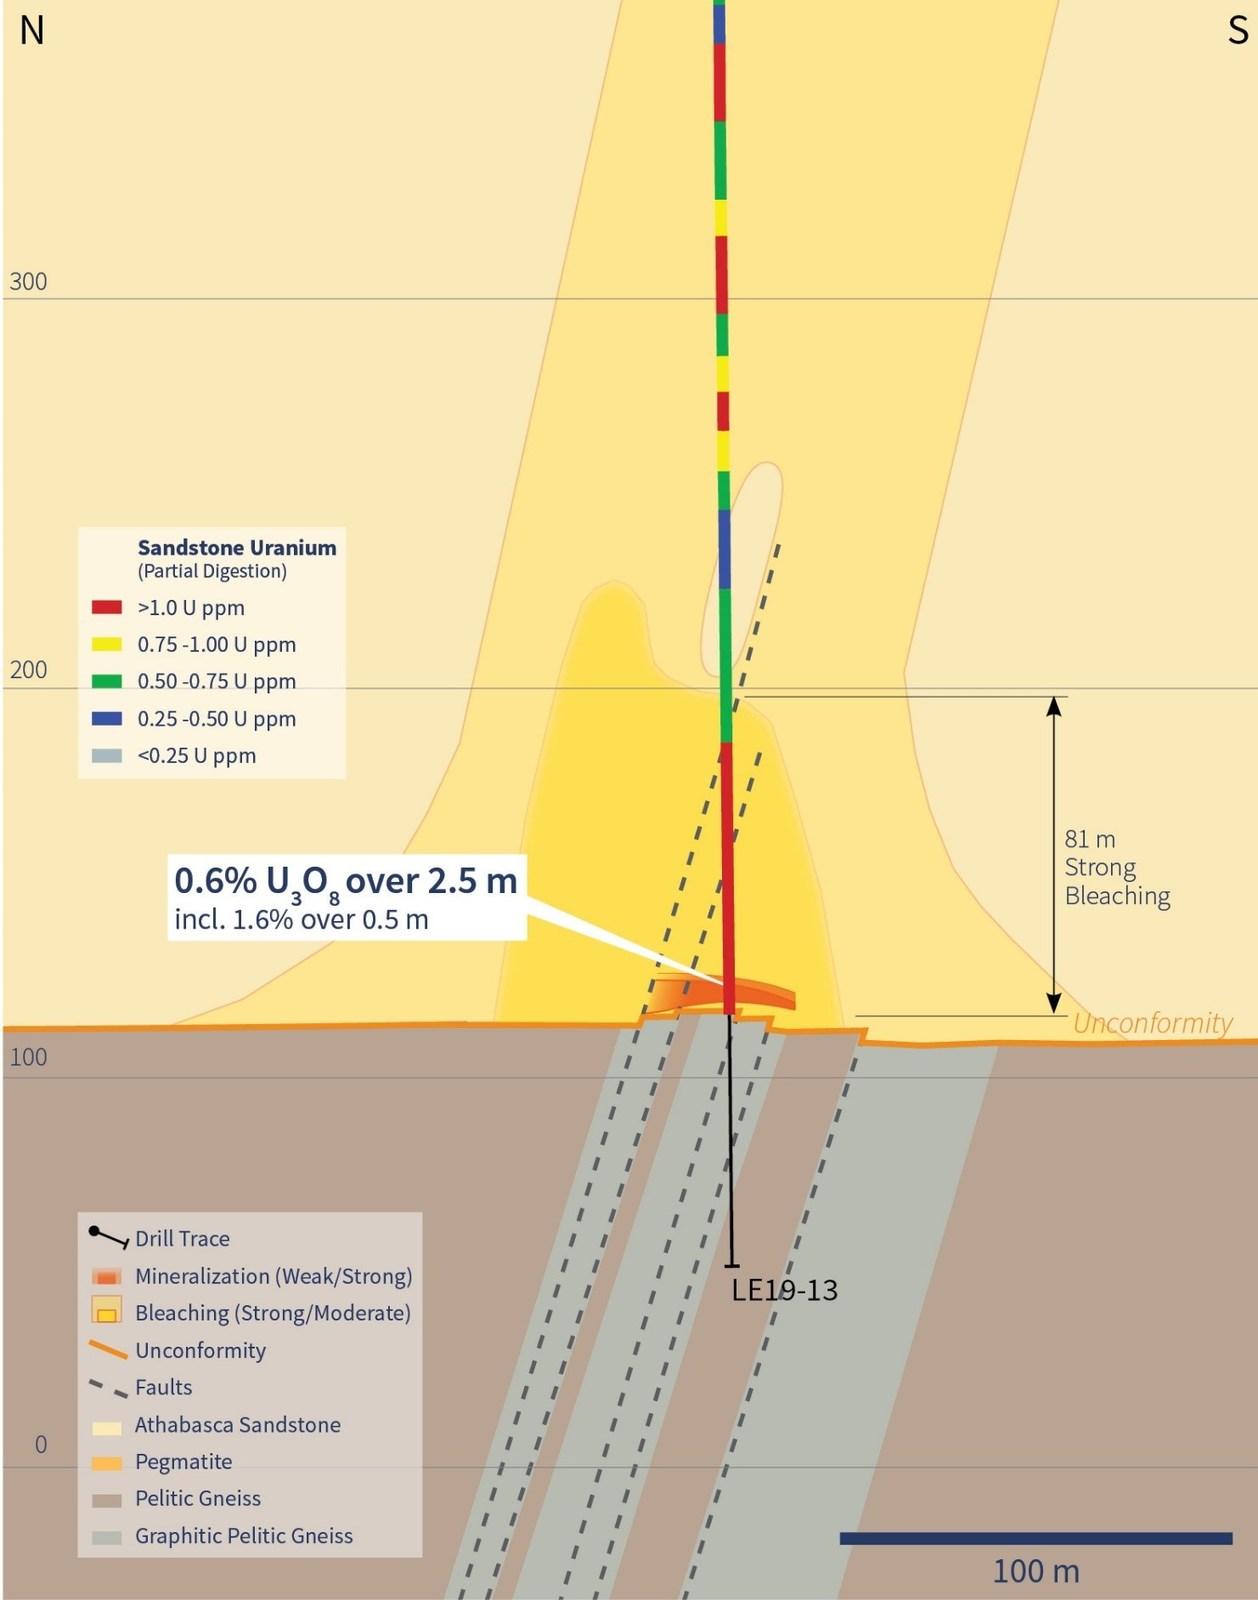 Figure 3 – Sandstone Uranium Geochemistry and Alteration on section 4635E